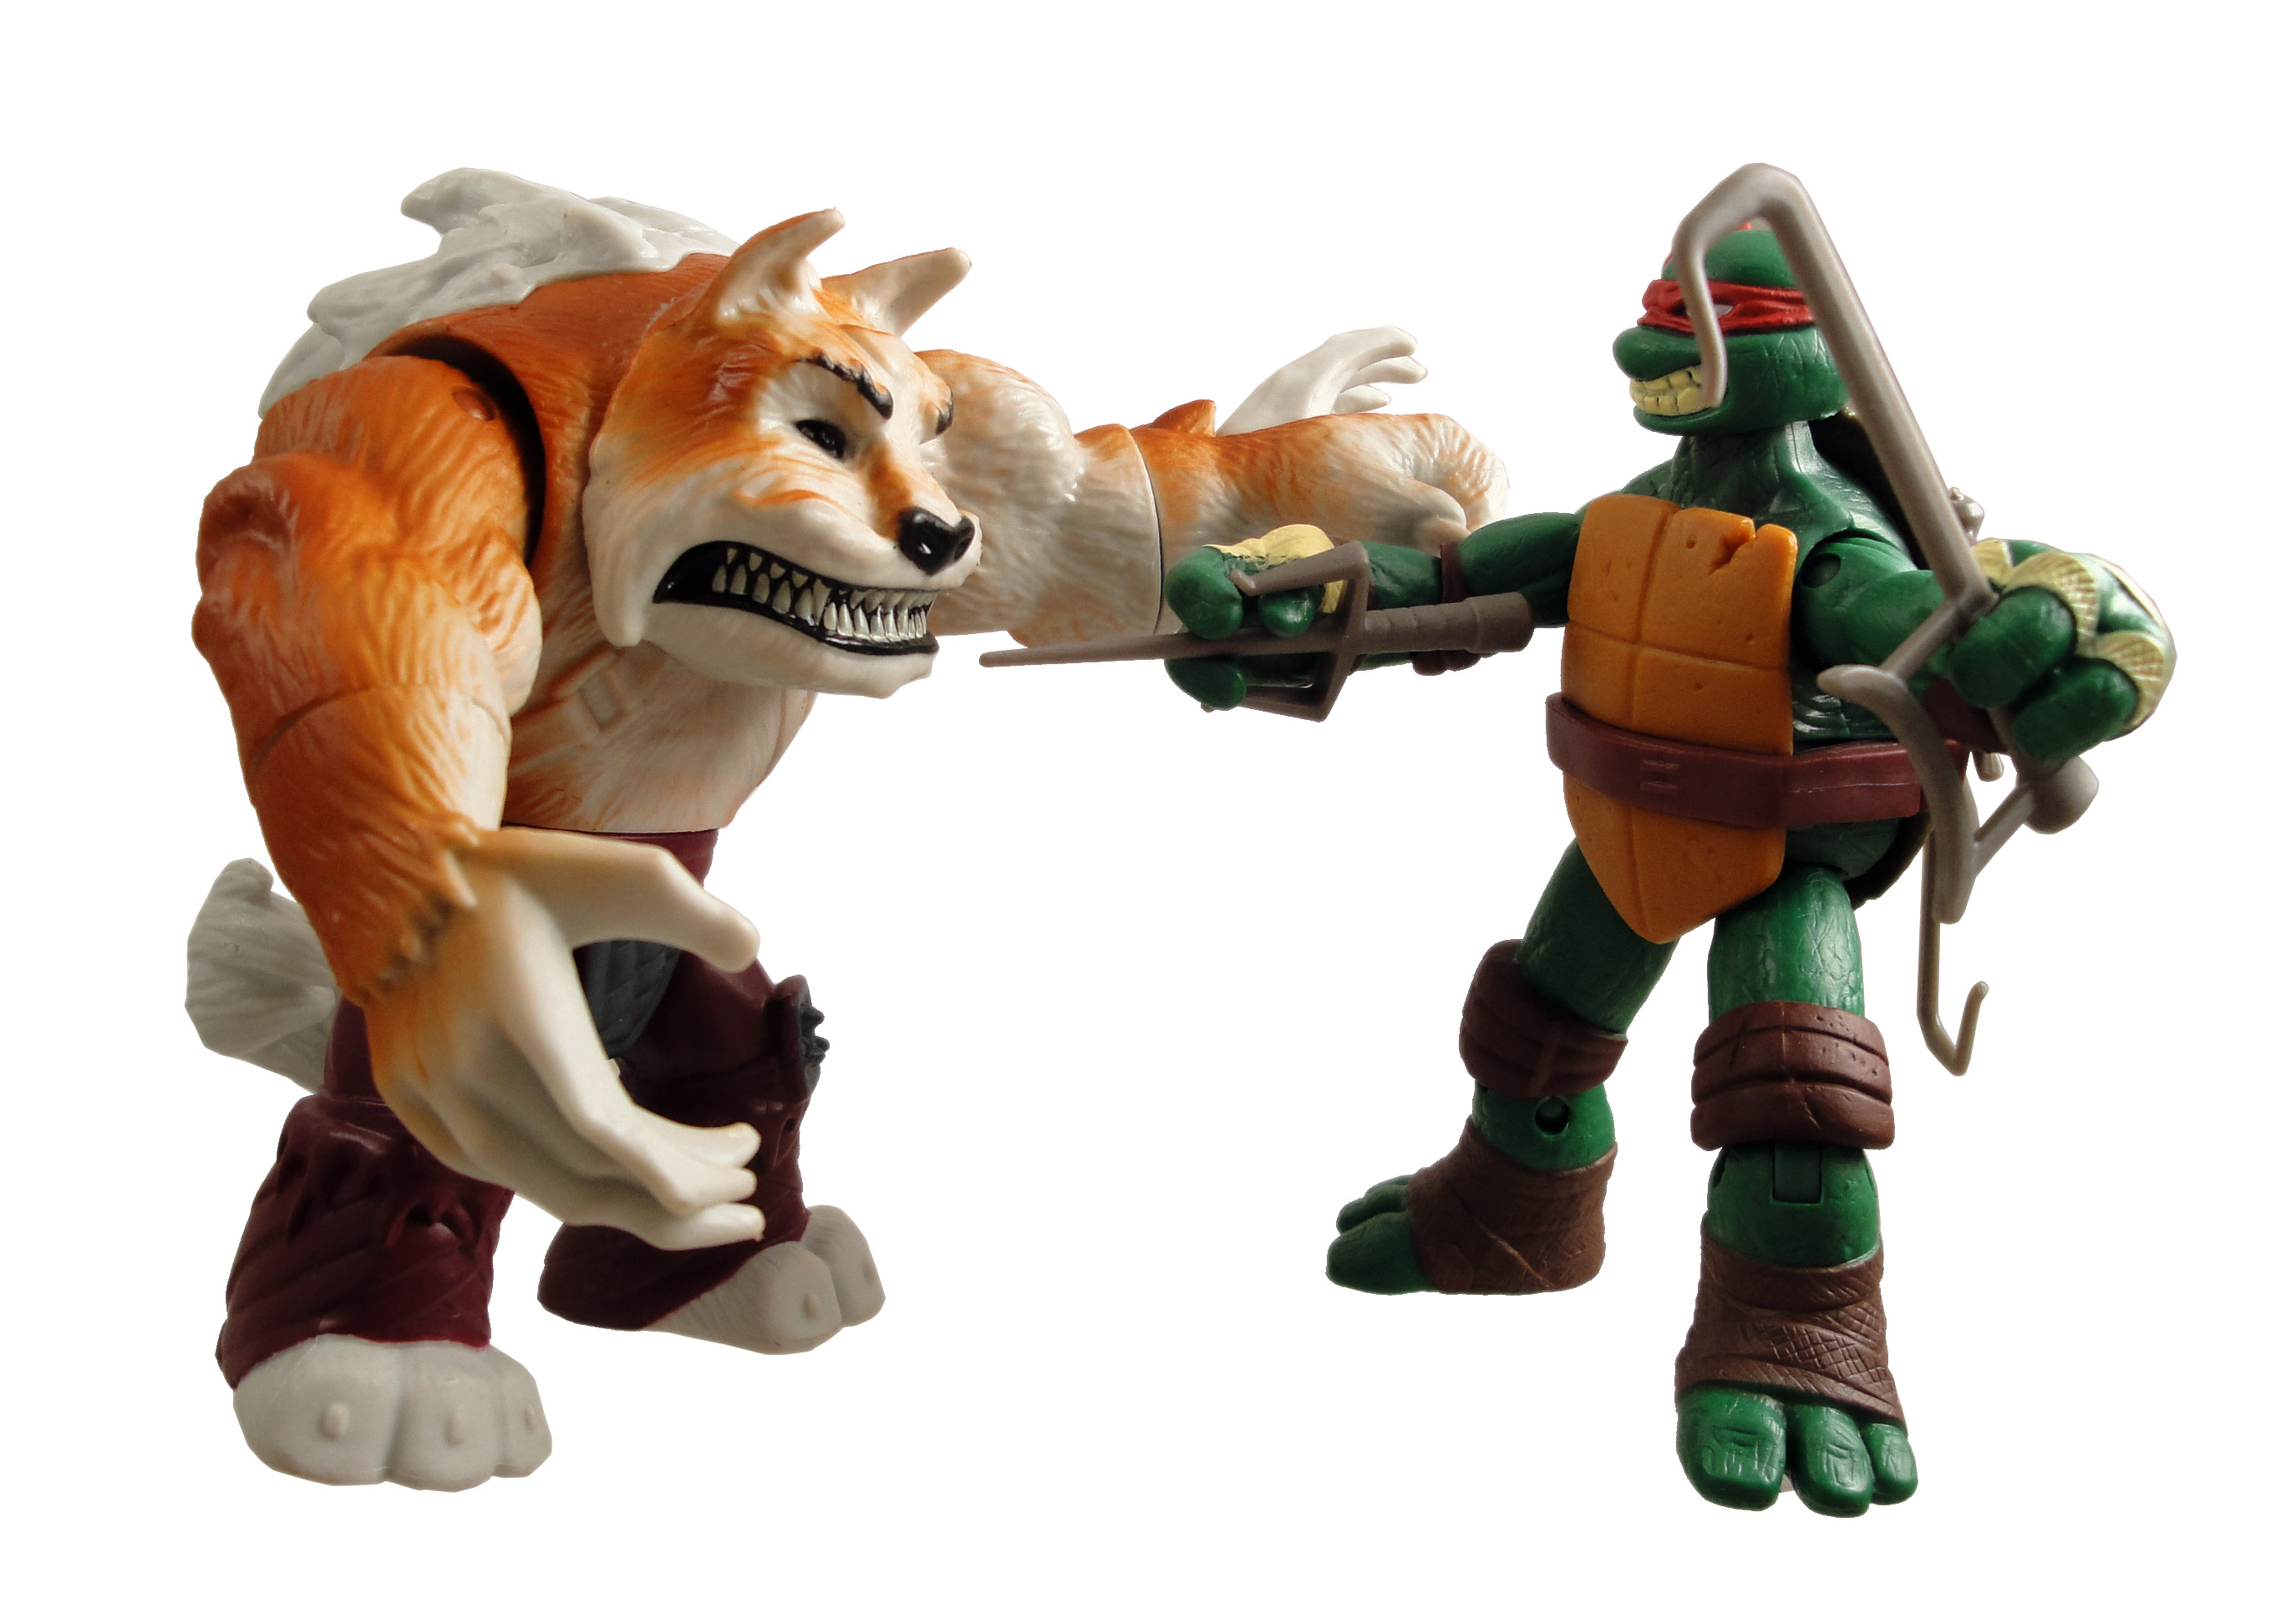 Nickelodeon Teenage Mutant Ninja Turtles Dogpound